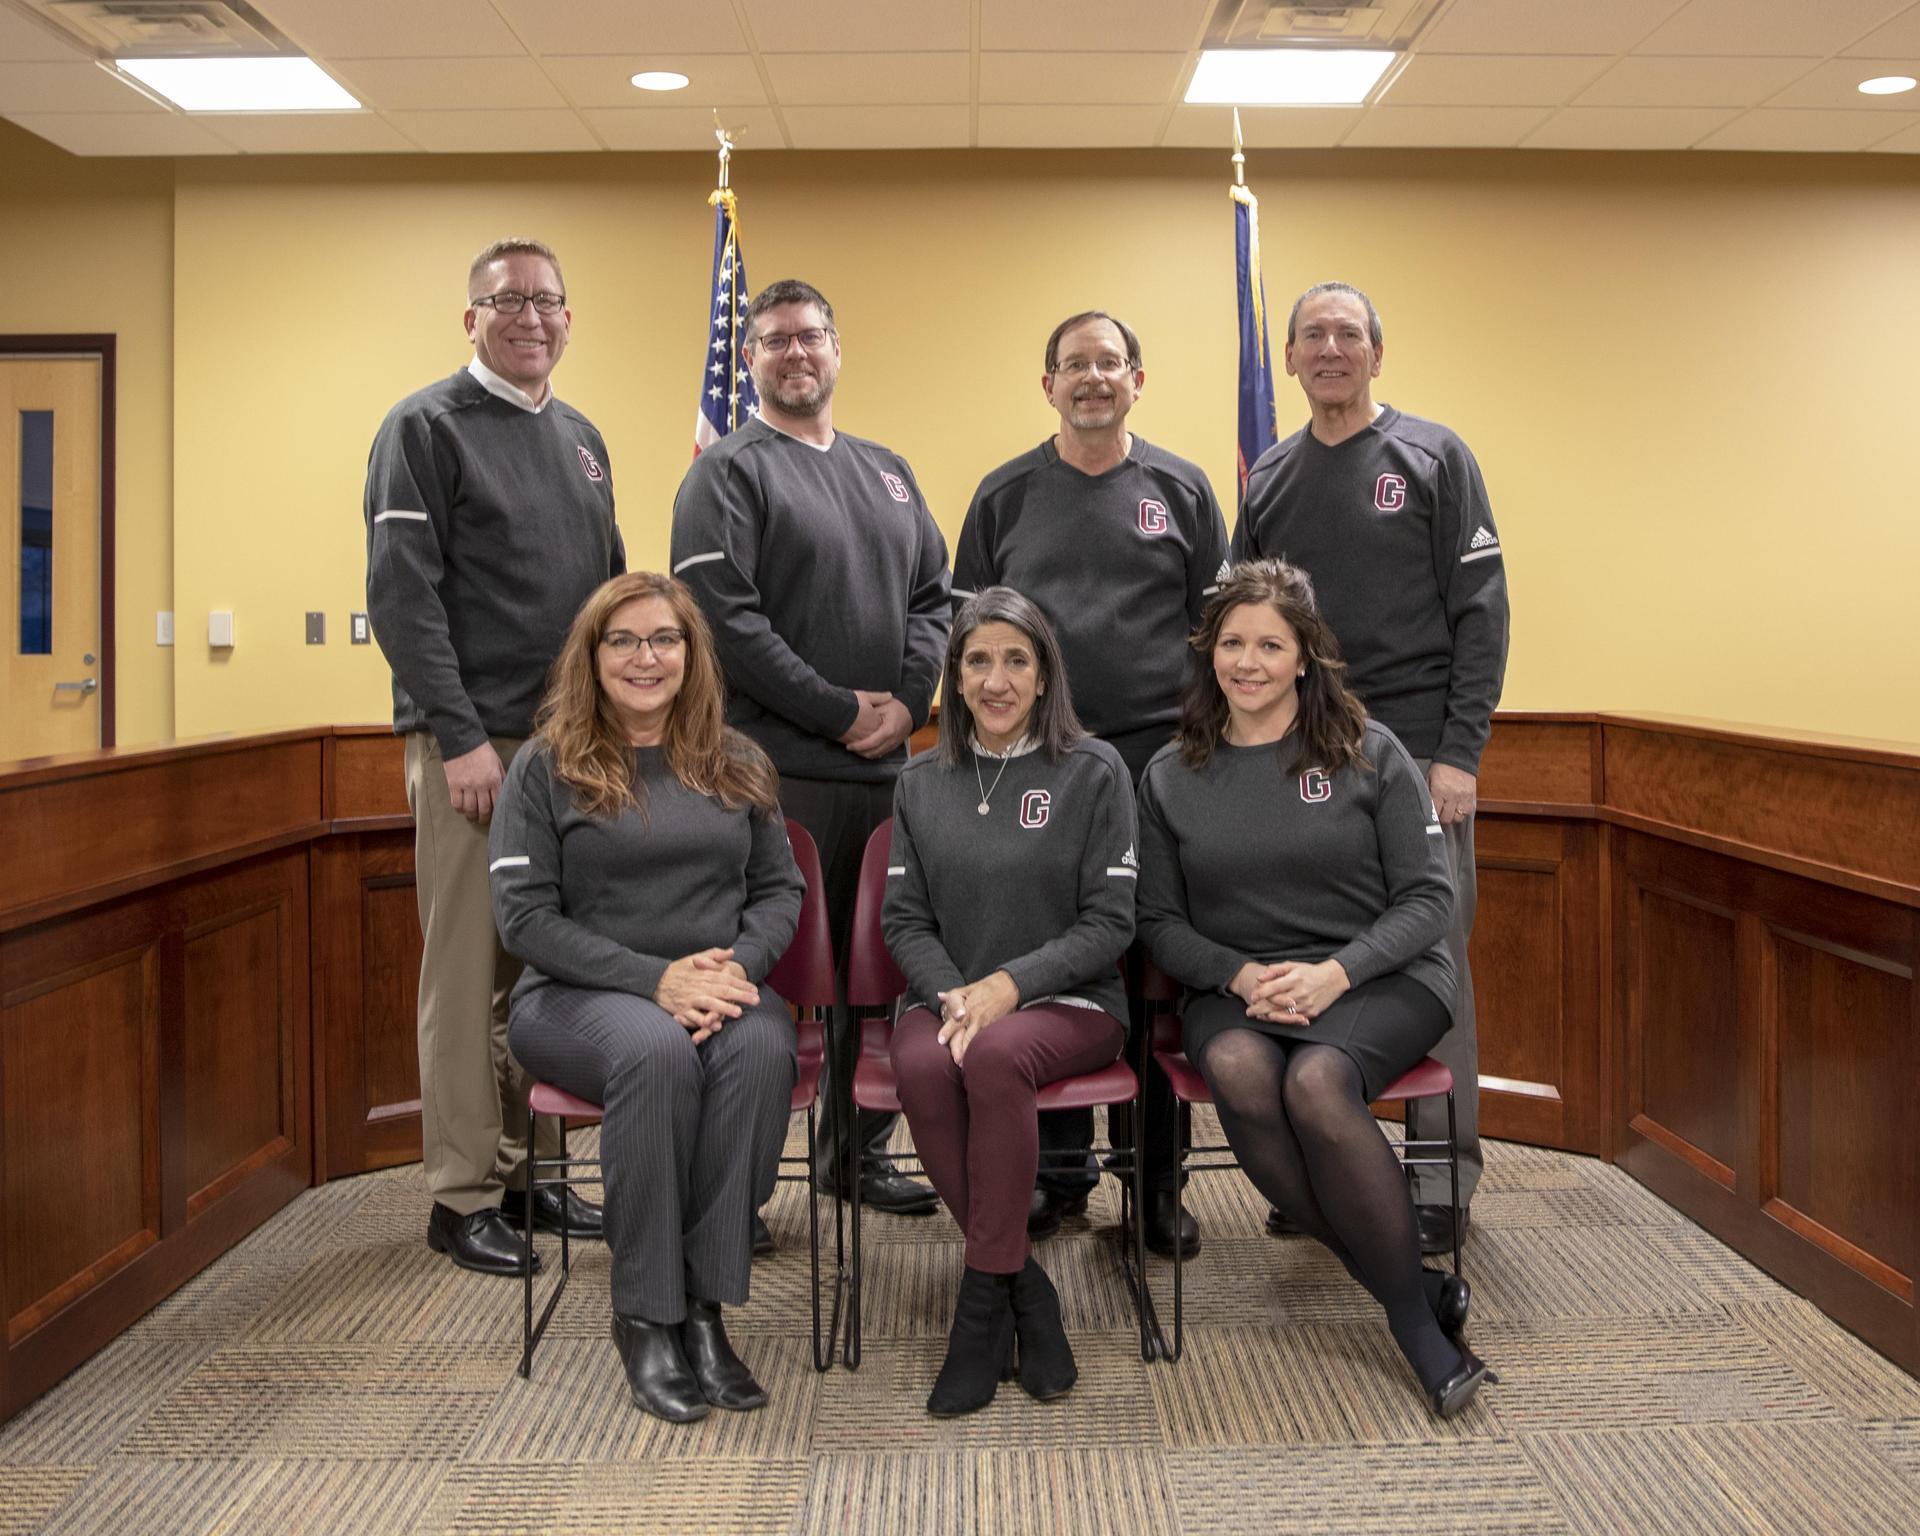 7 board members pose in board room